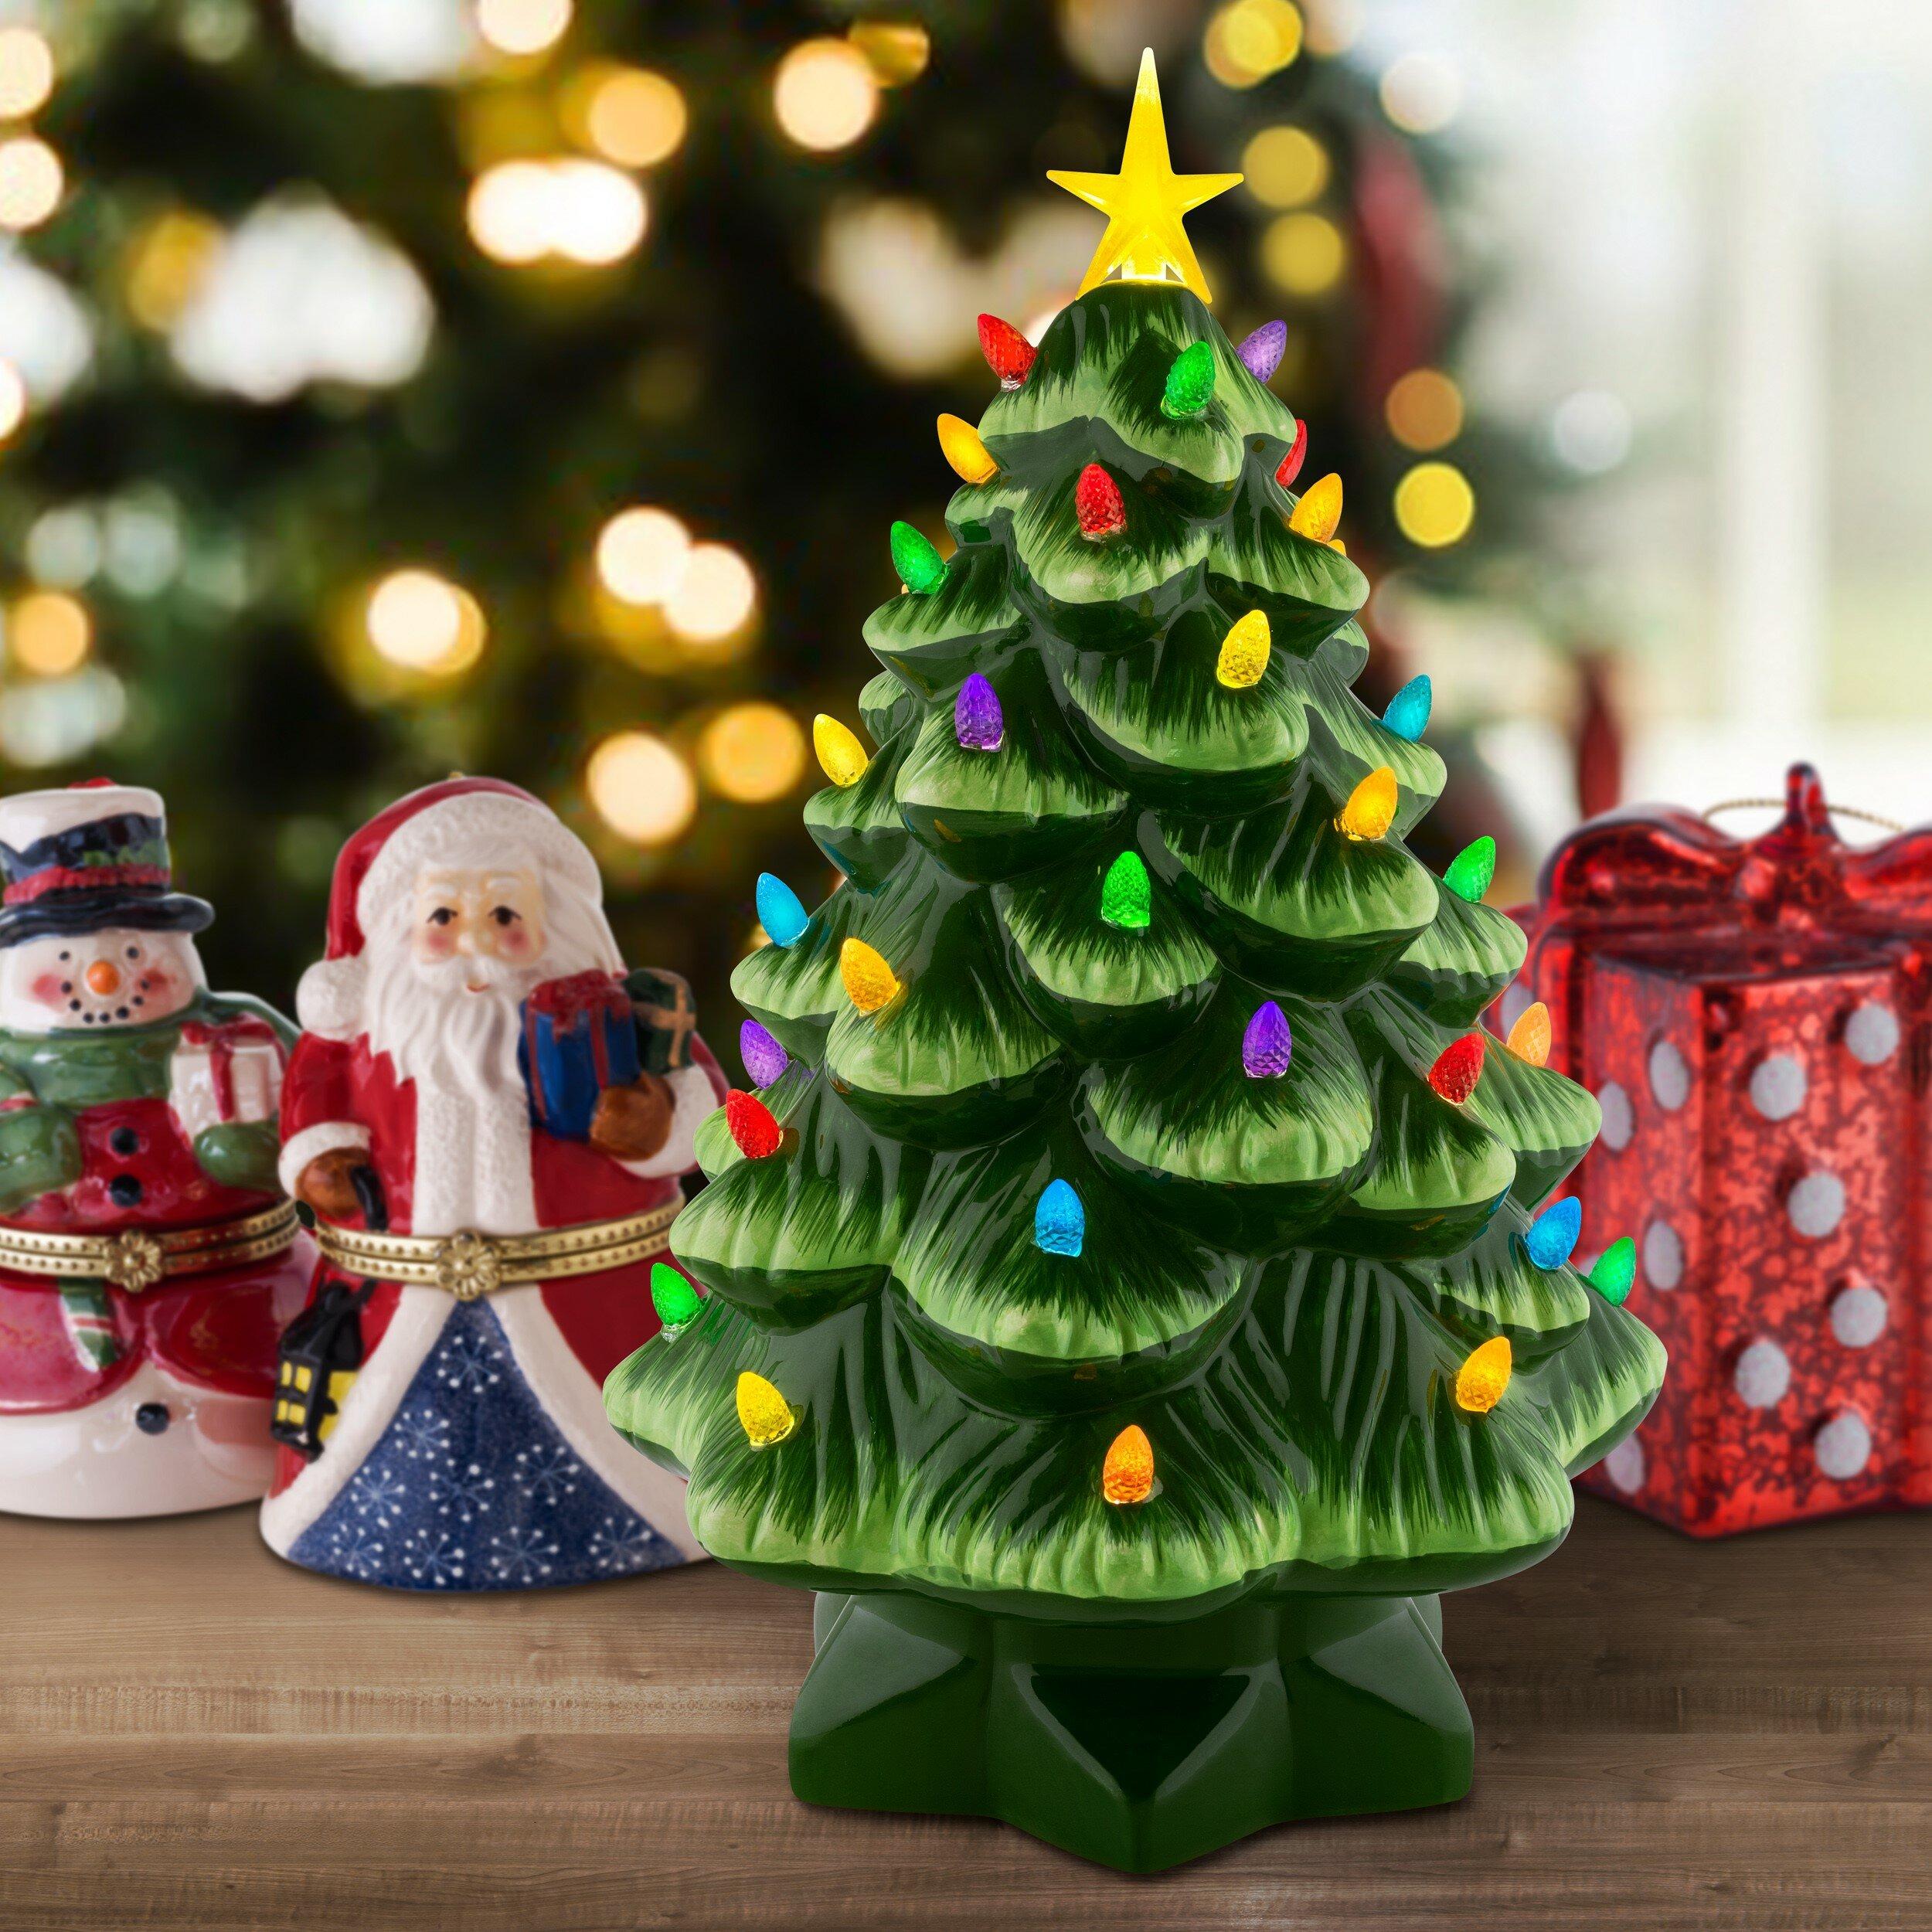 The Holiday Aisle Nostalgic Christmas Tabletop Tree Reviews Wayfair